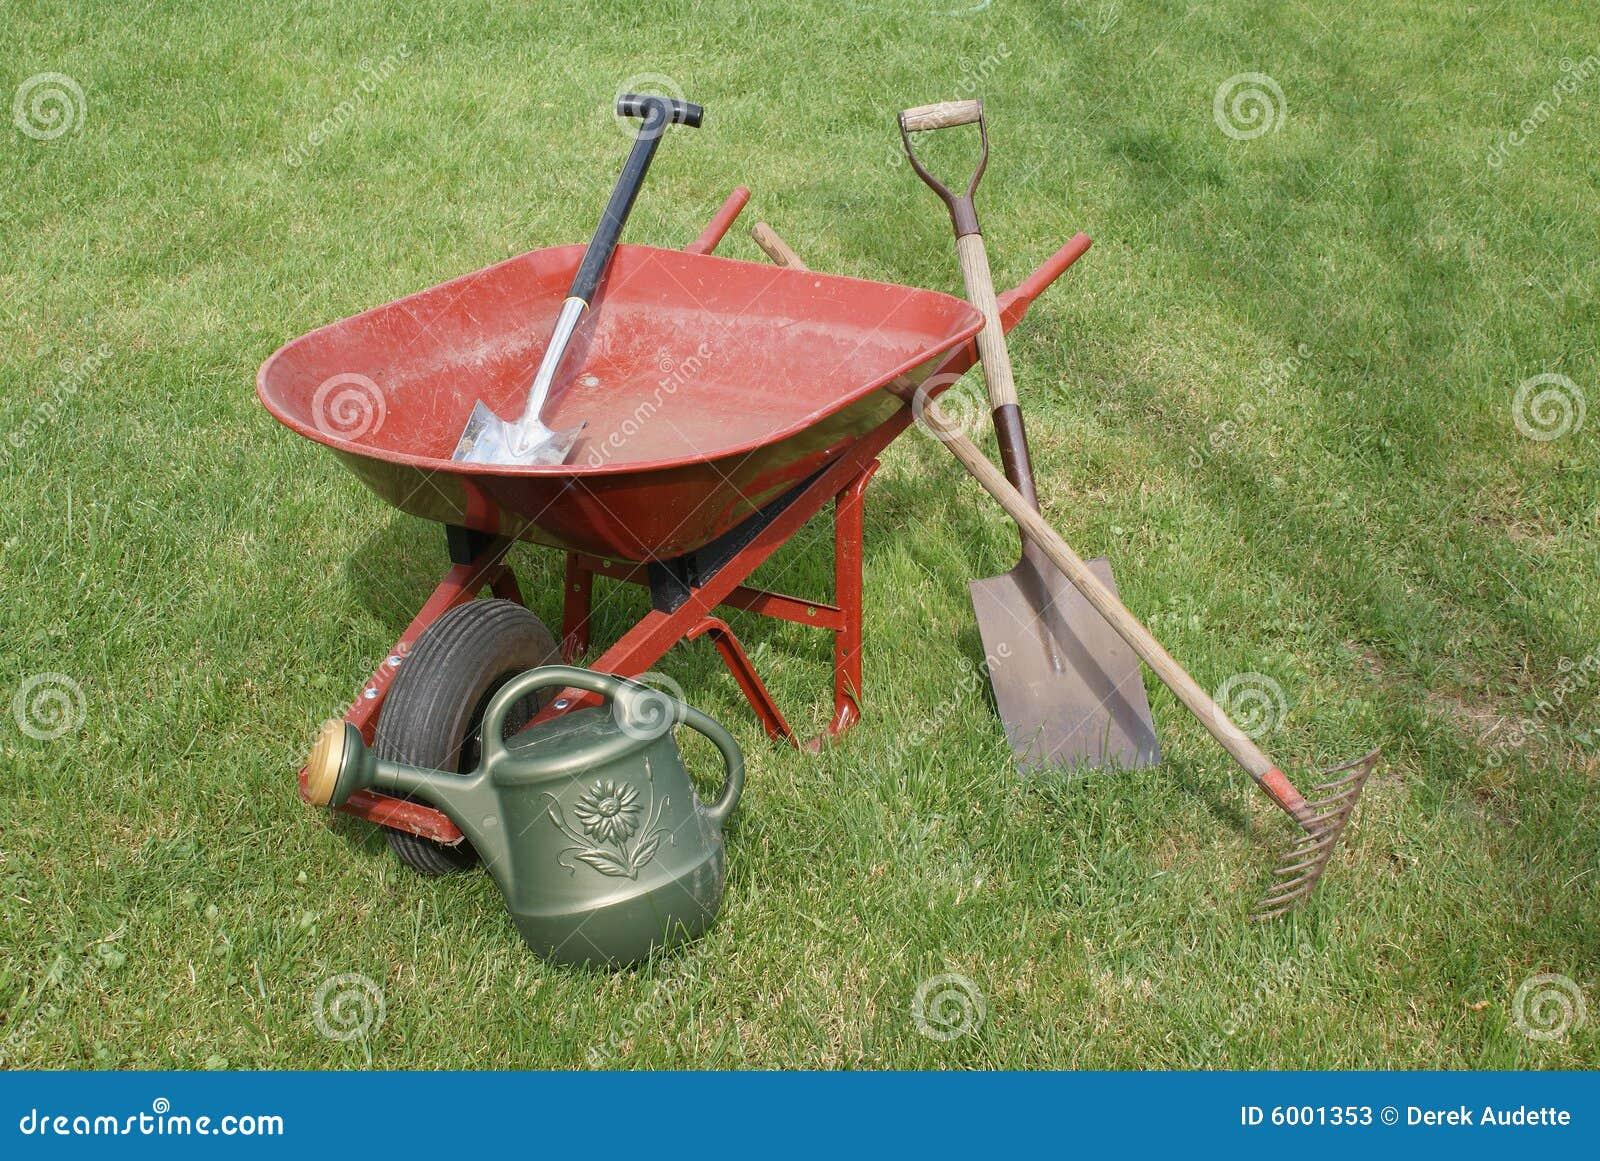 Gardening tools and equipment stock image image 6001353 for Gardening tools and equipment